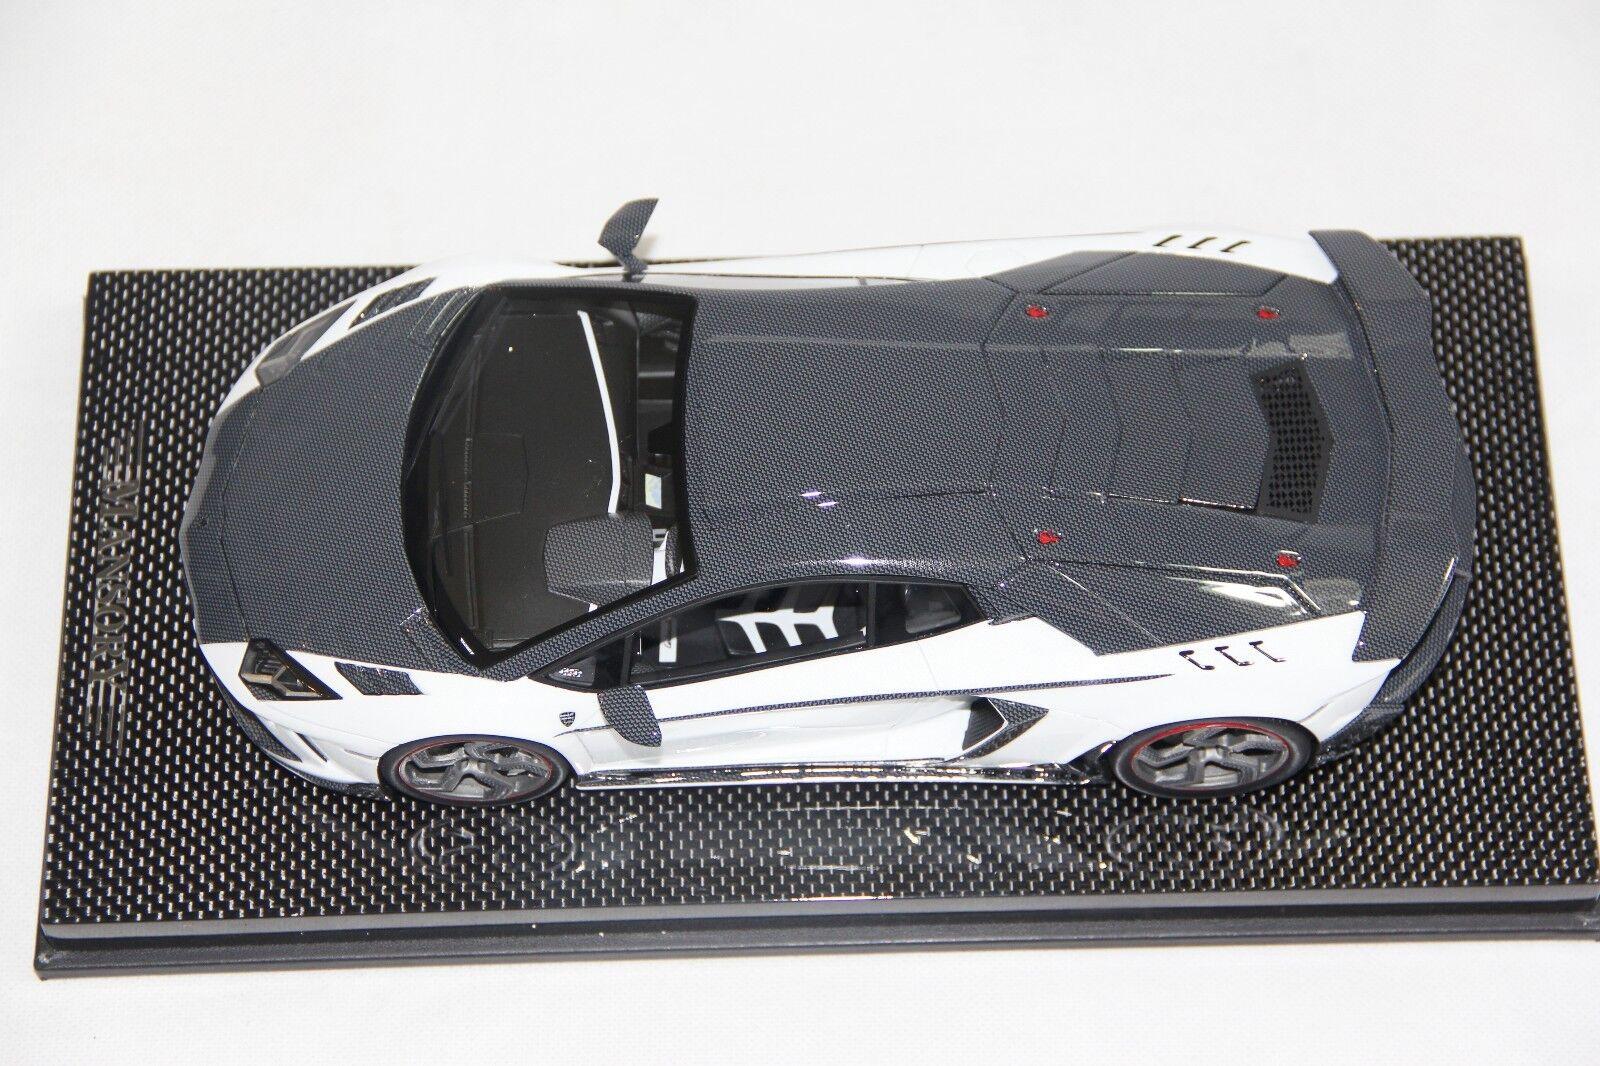 Mansory Lamborghini Carbonado Carbonado Carbonado GT White Carbon, Ltd 30 pcs 1 18 Mansory 93658a